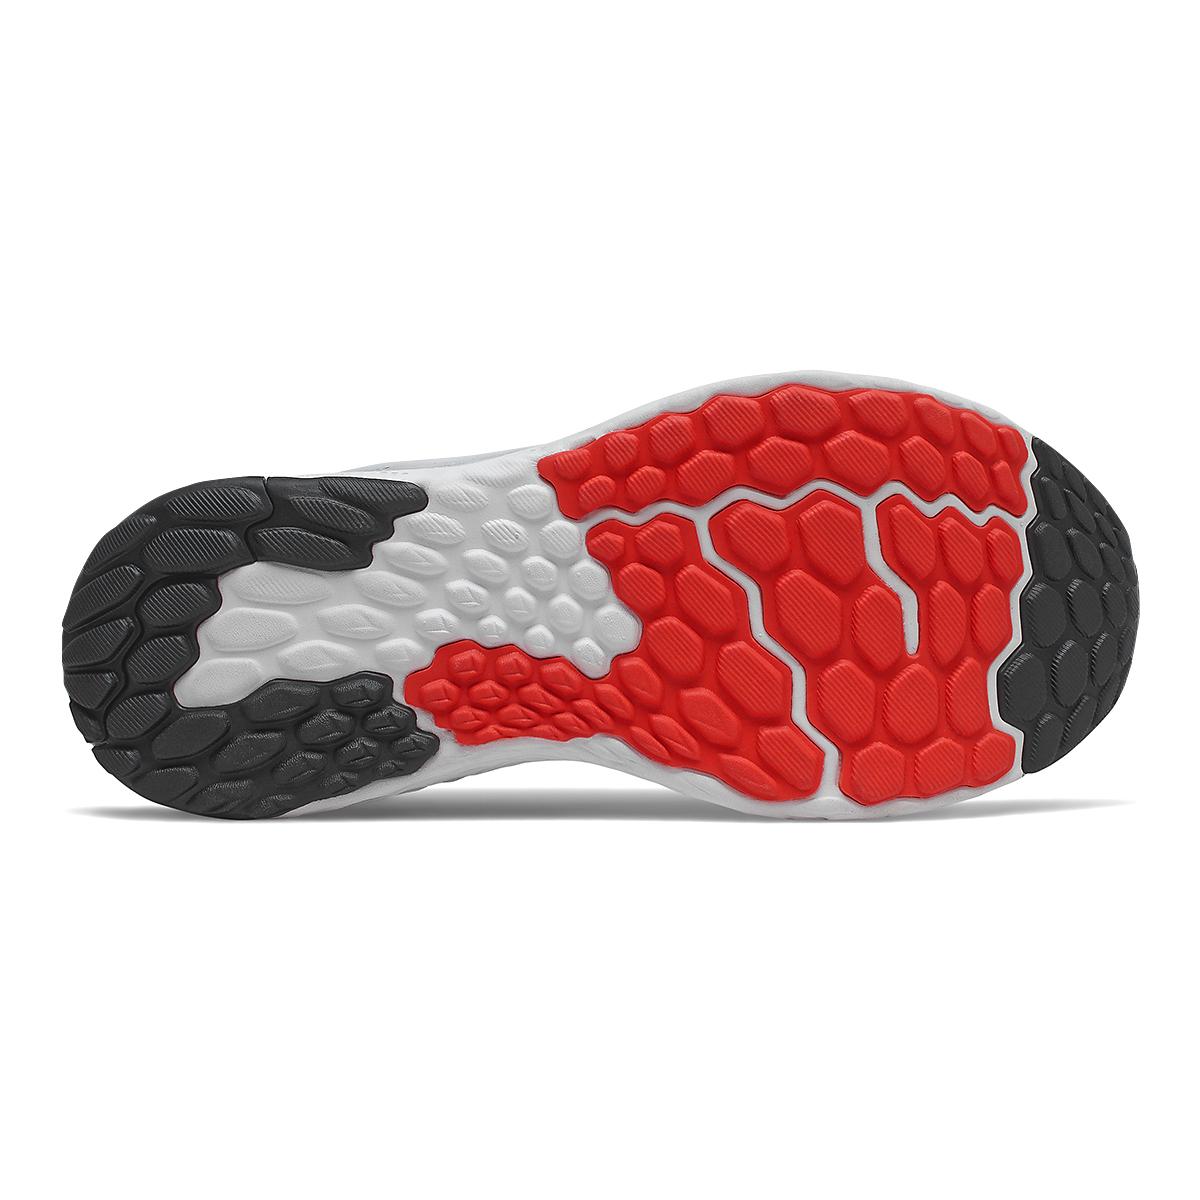 Men's New Balance 1080v11 Running Shoe - Color: Velocity Red/Black - Size: 7 - Width: Wide, Velocity Red/Black, large, image 3